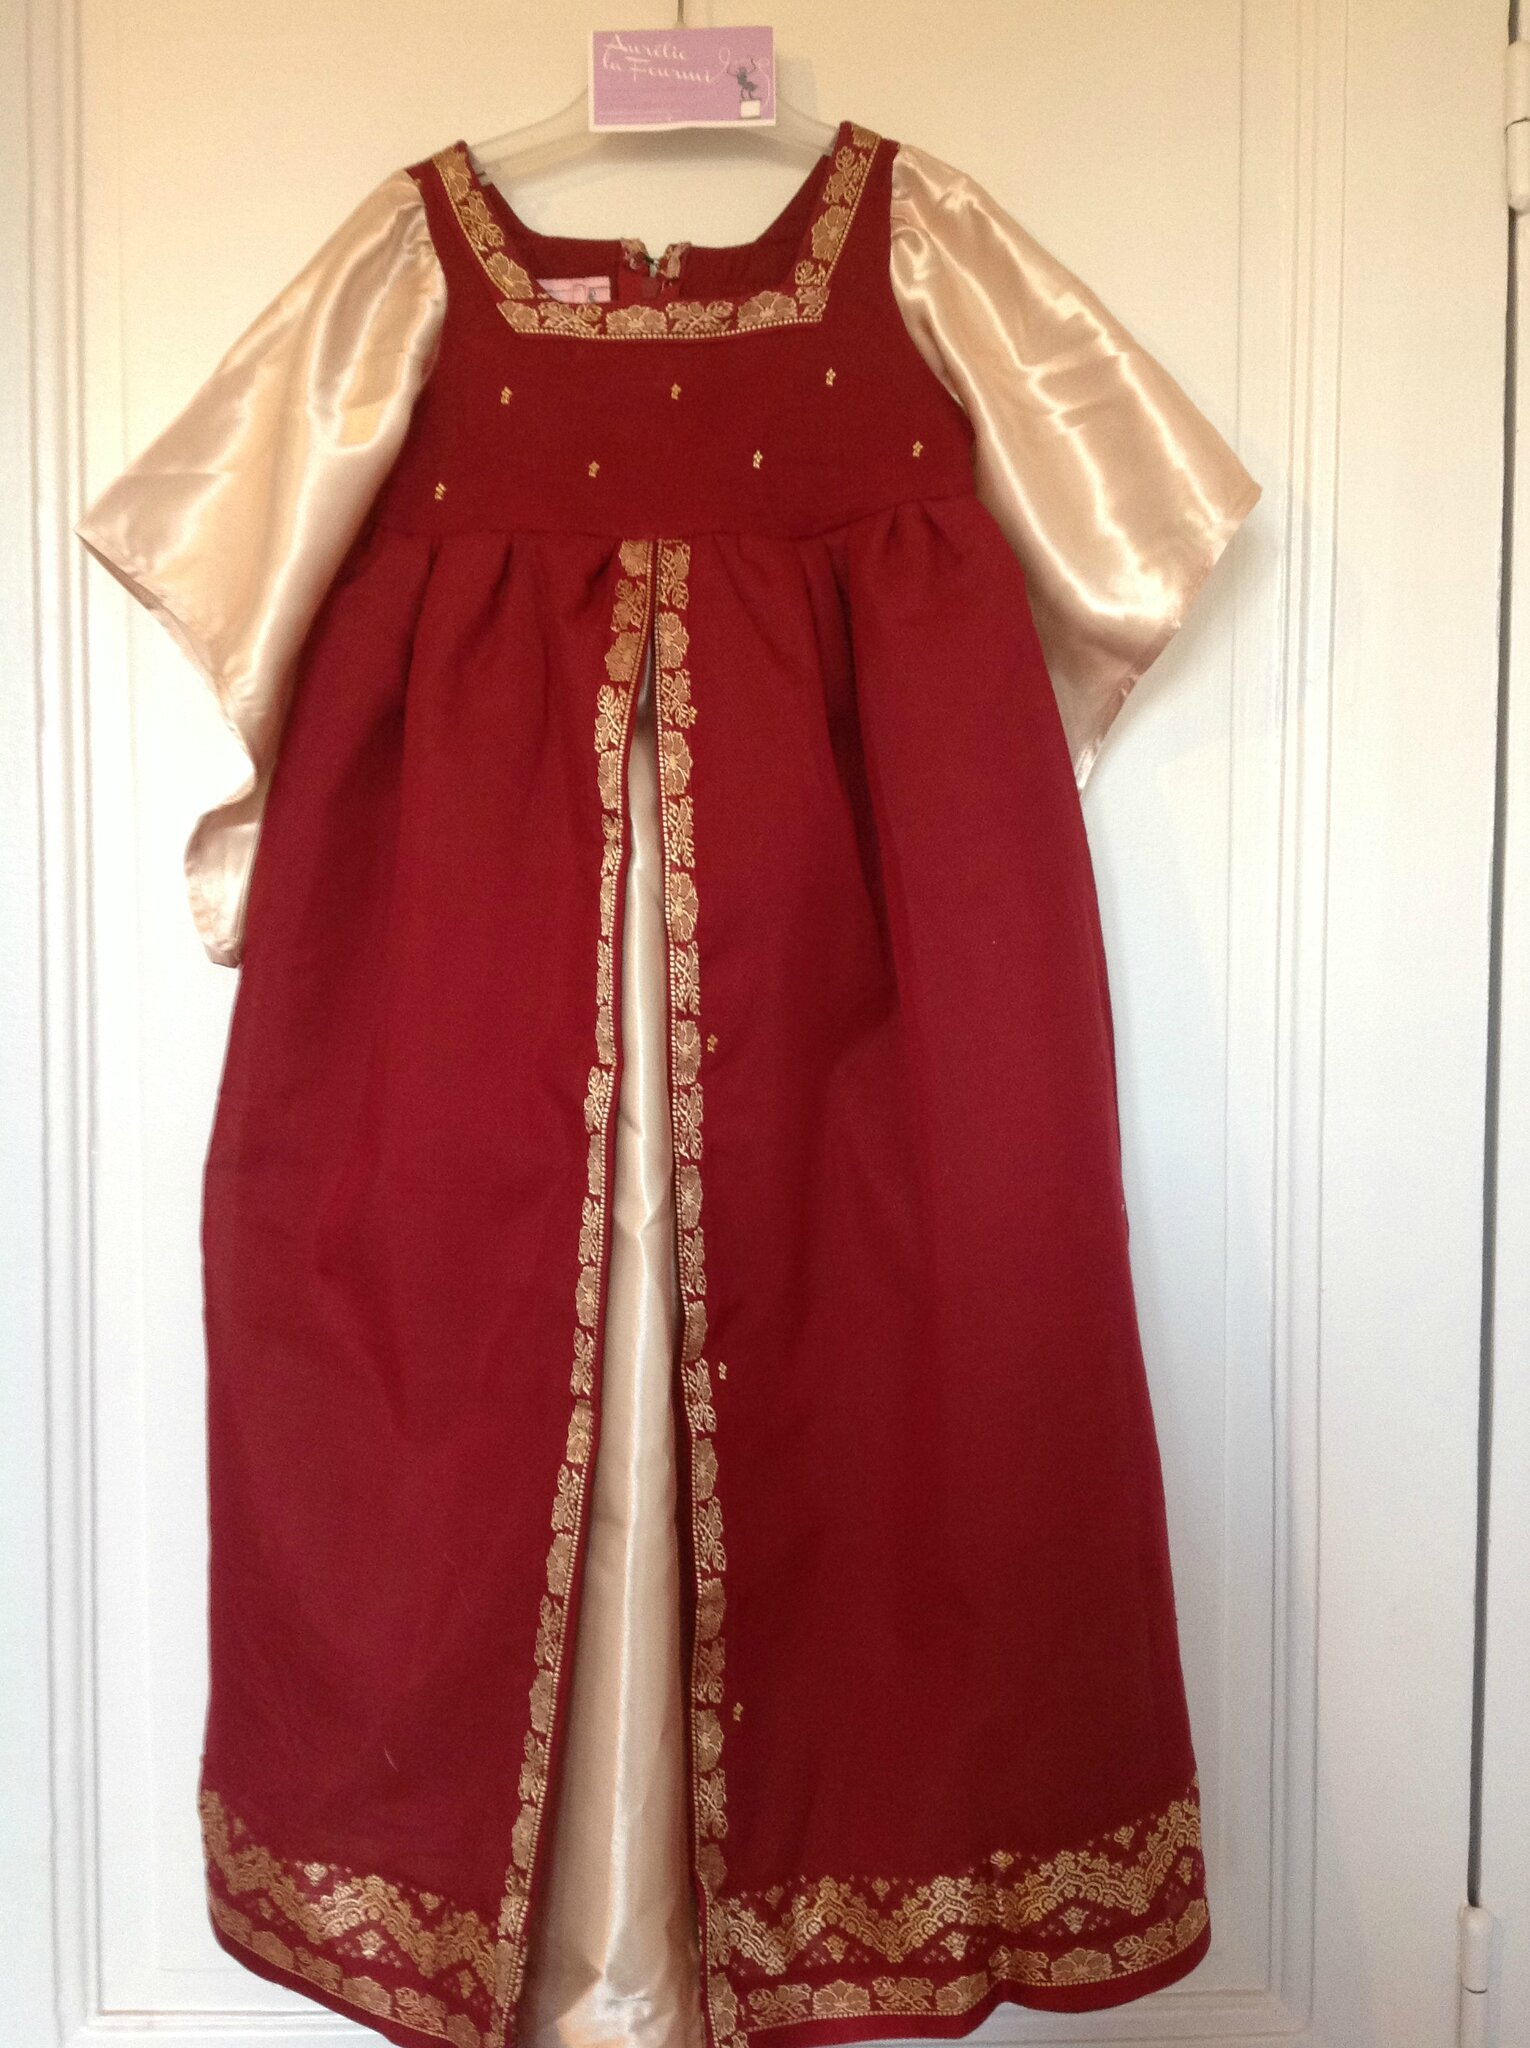 Robe de princesse 4 ans 70€